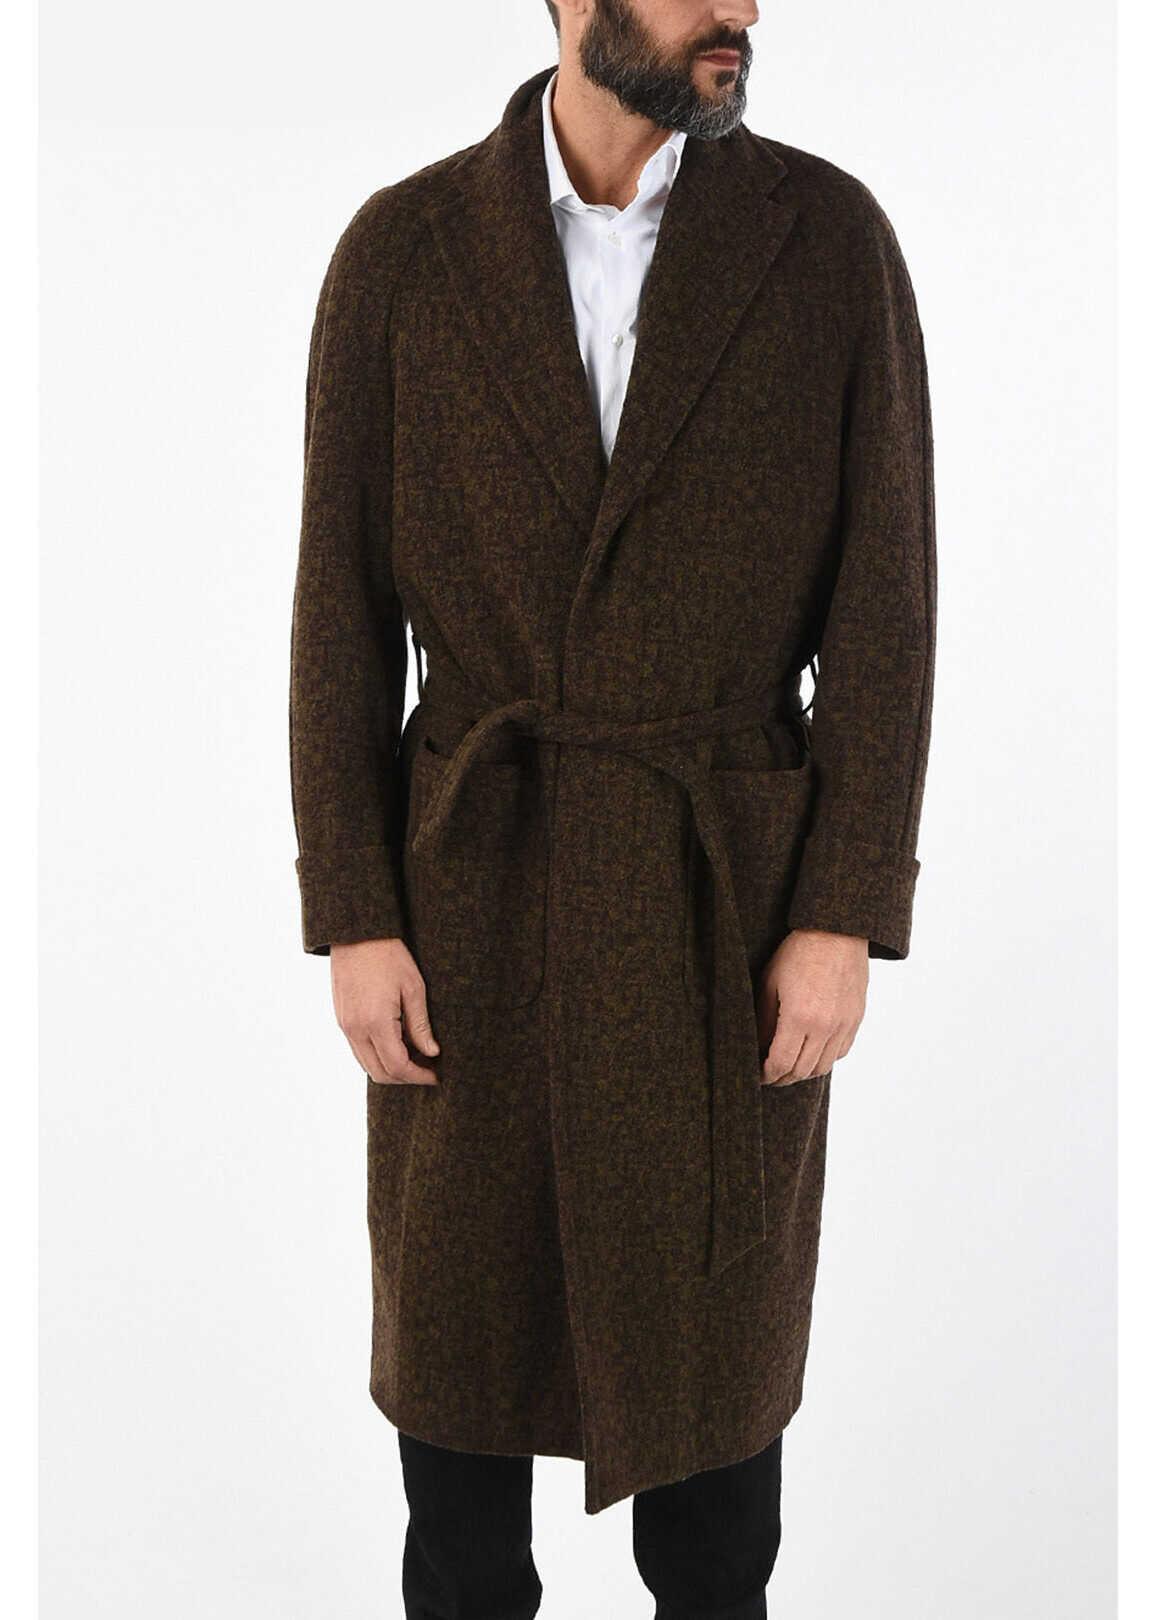 CORNELIANI virgin wool single breasted trench BROWN imagine